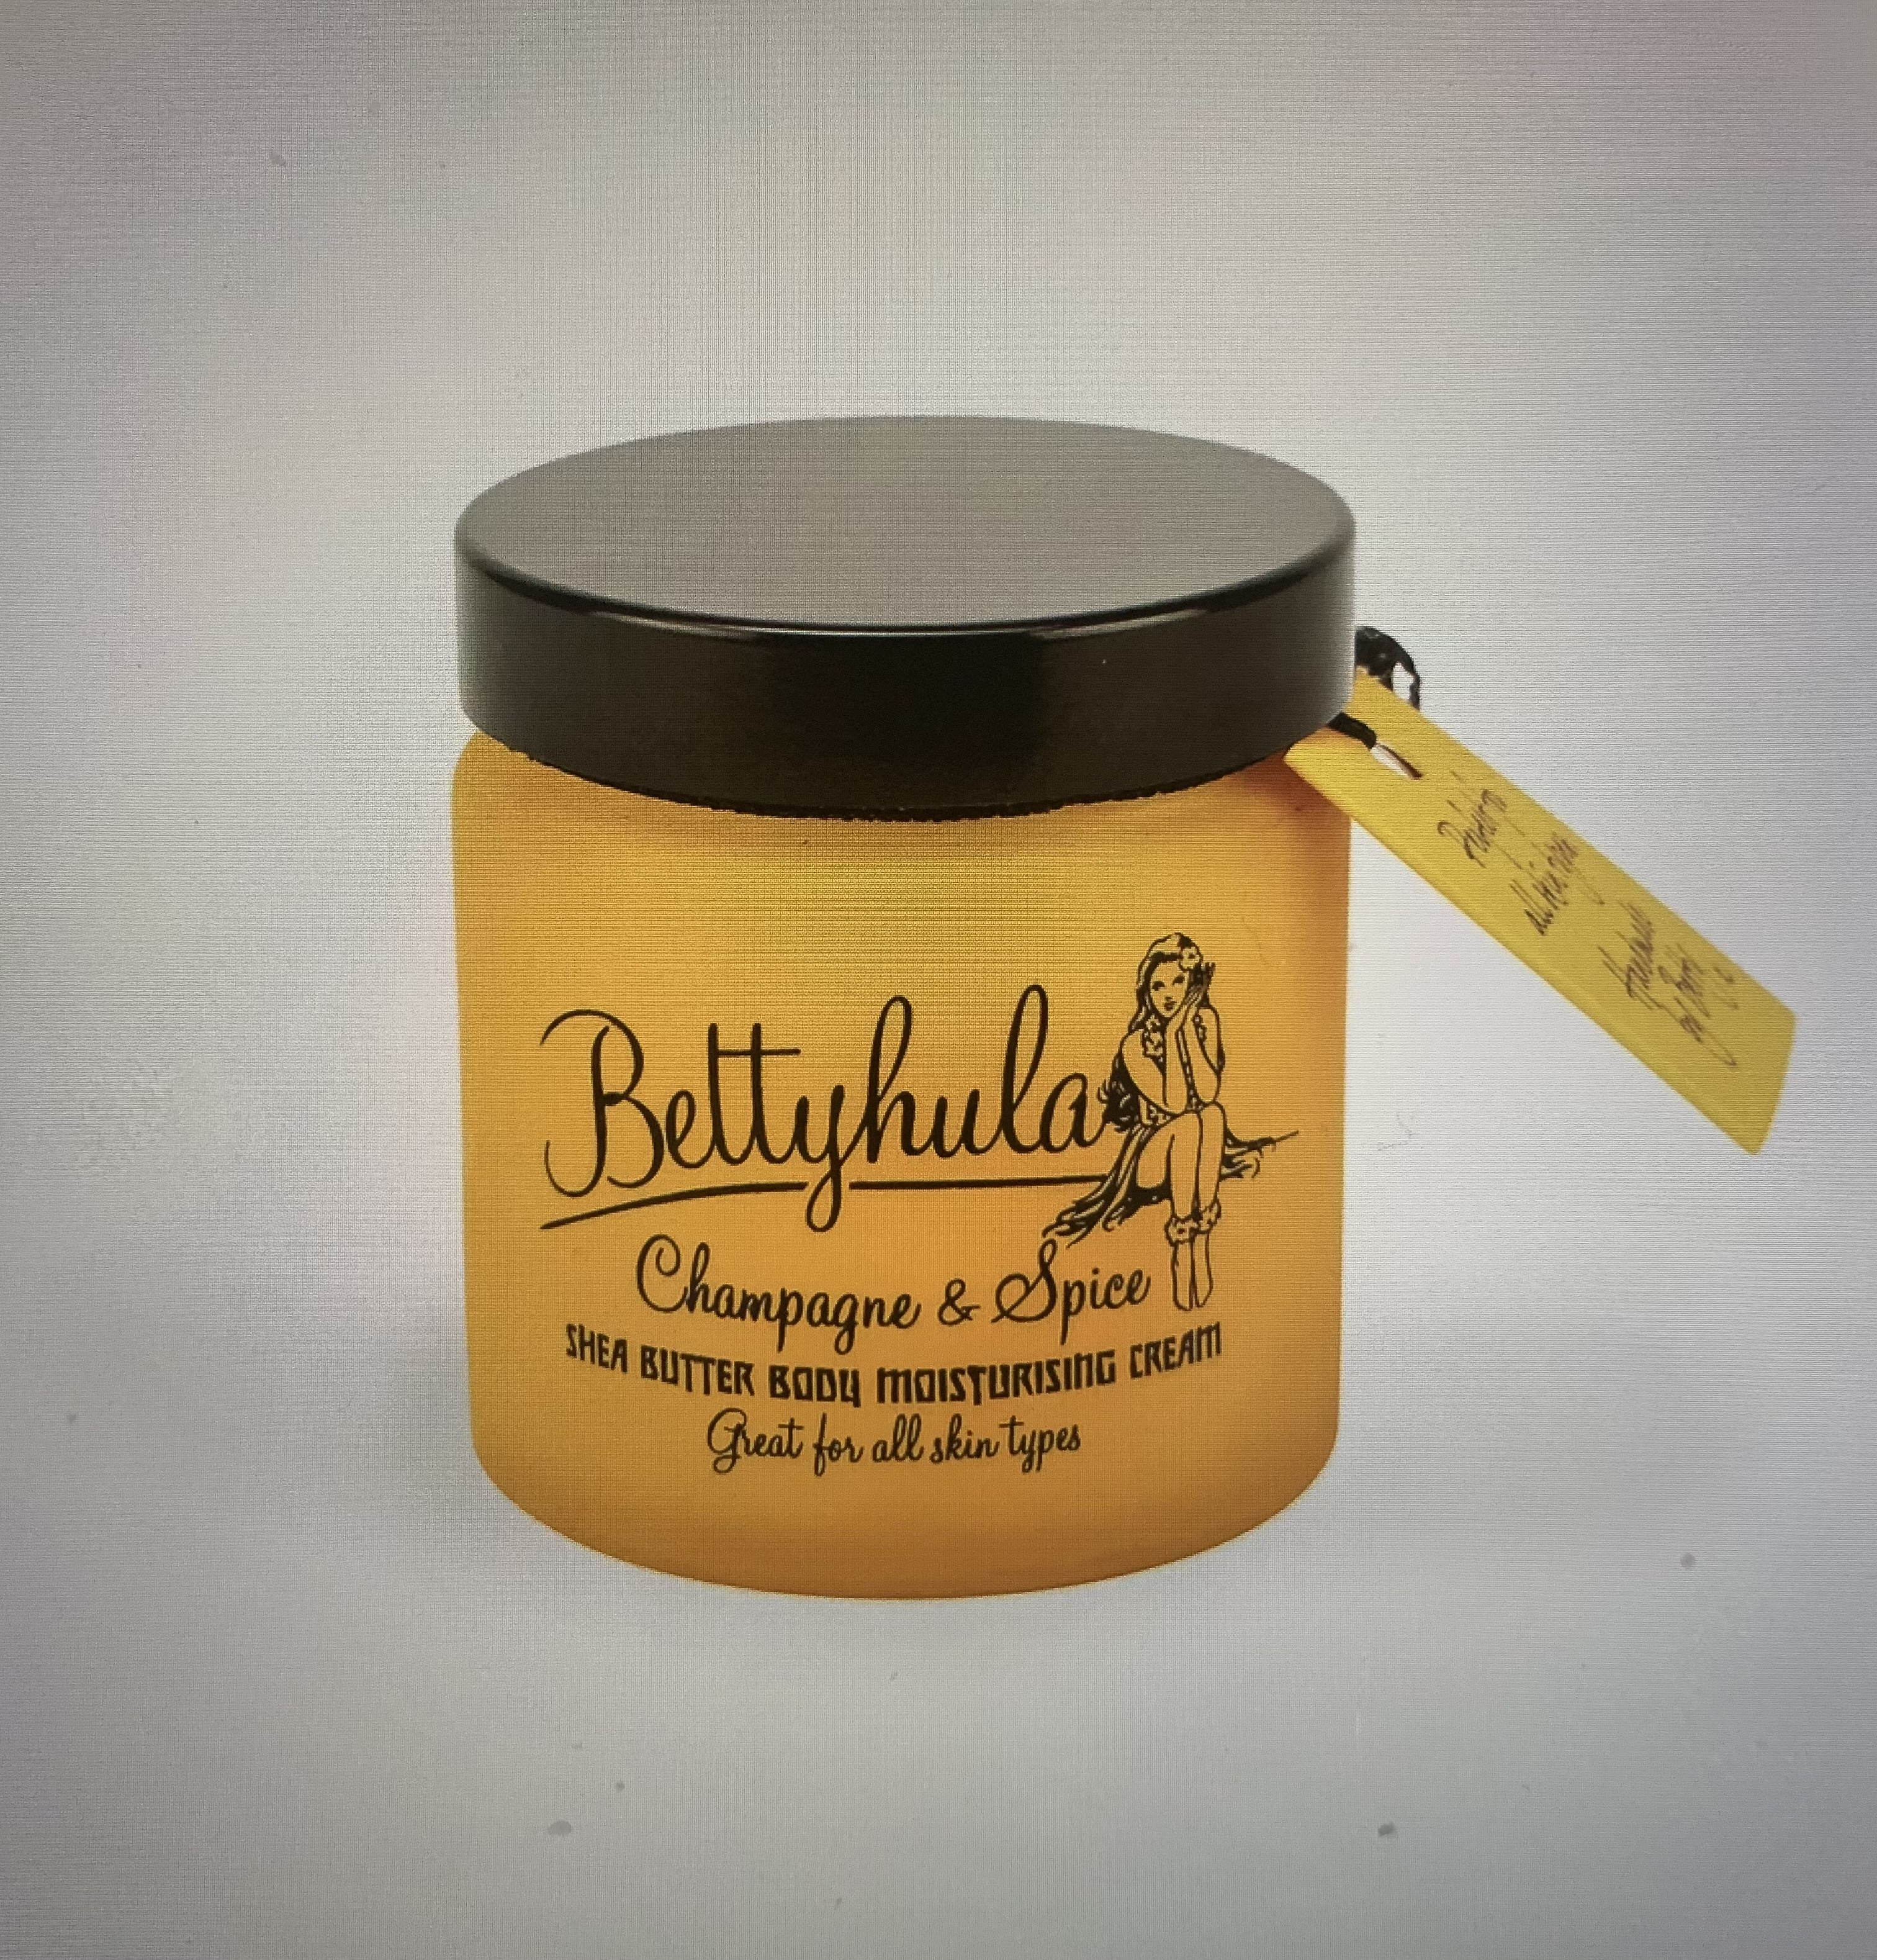 Betty Hula Shea Butter Body Moisturiser - Champagne & Spice